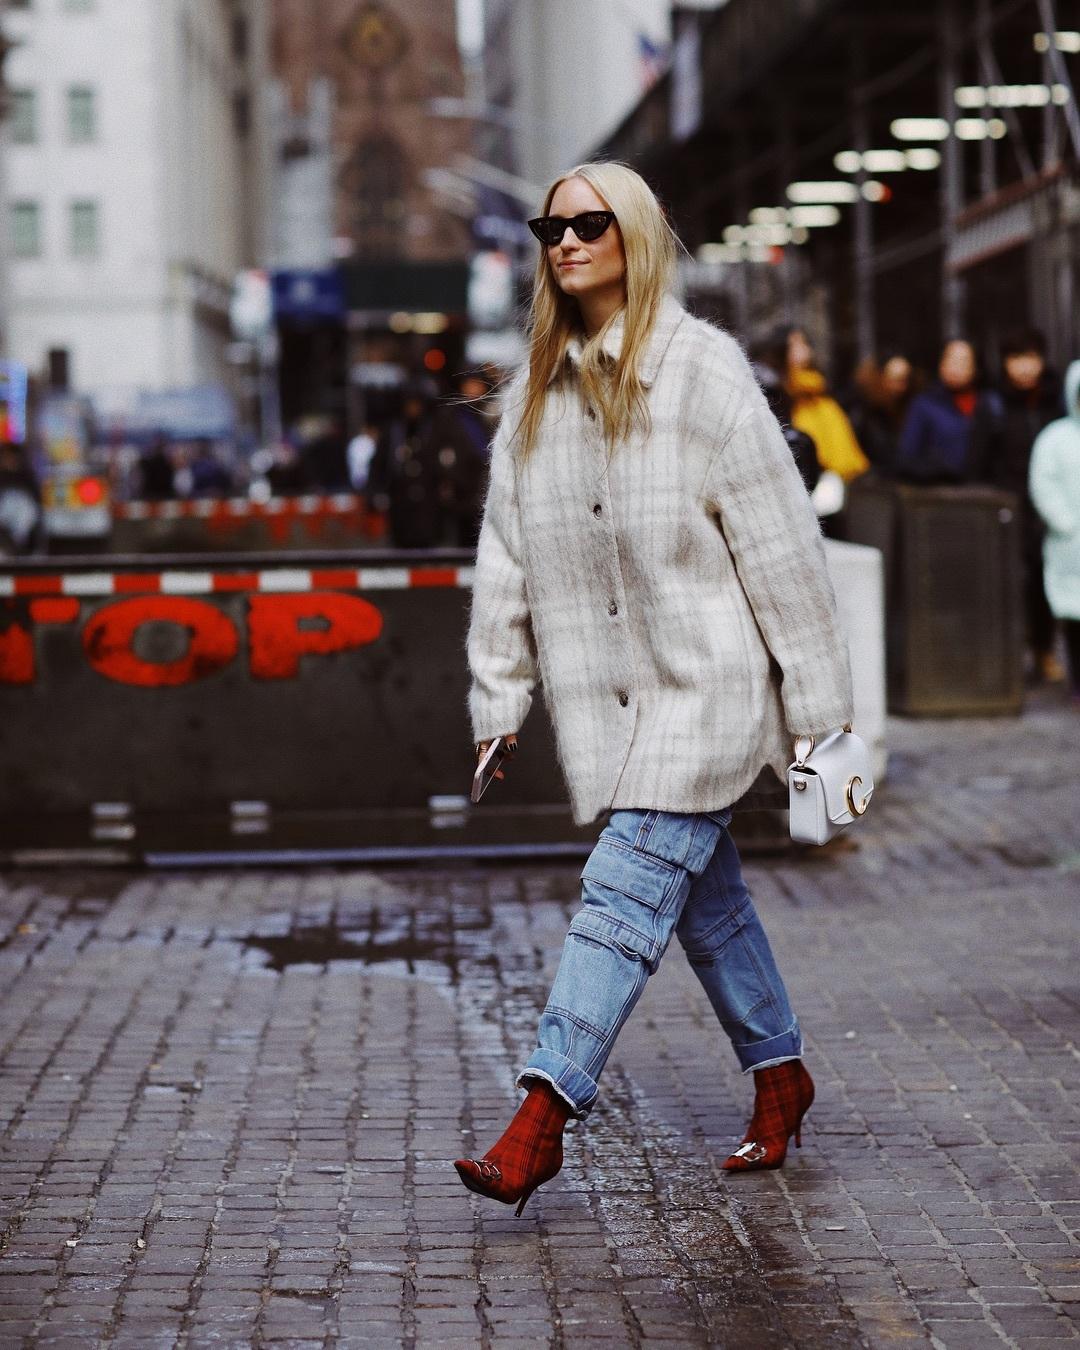 jeans high waisted jeans balenciaga plaid red boots heel boots oversized jacket white bag handbag chloe